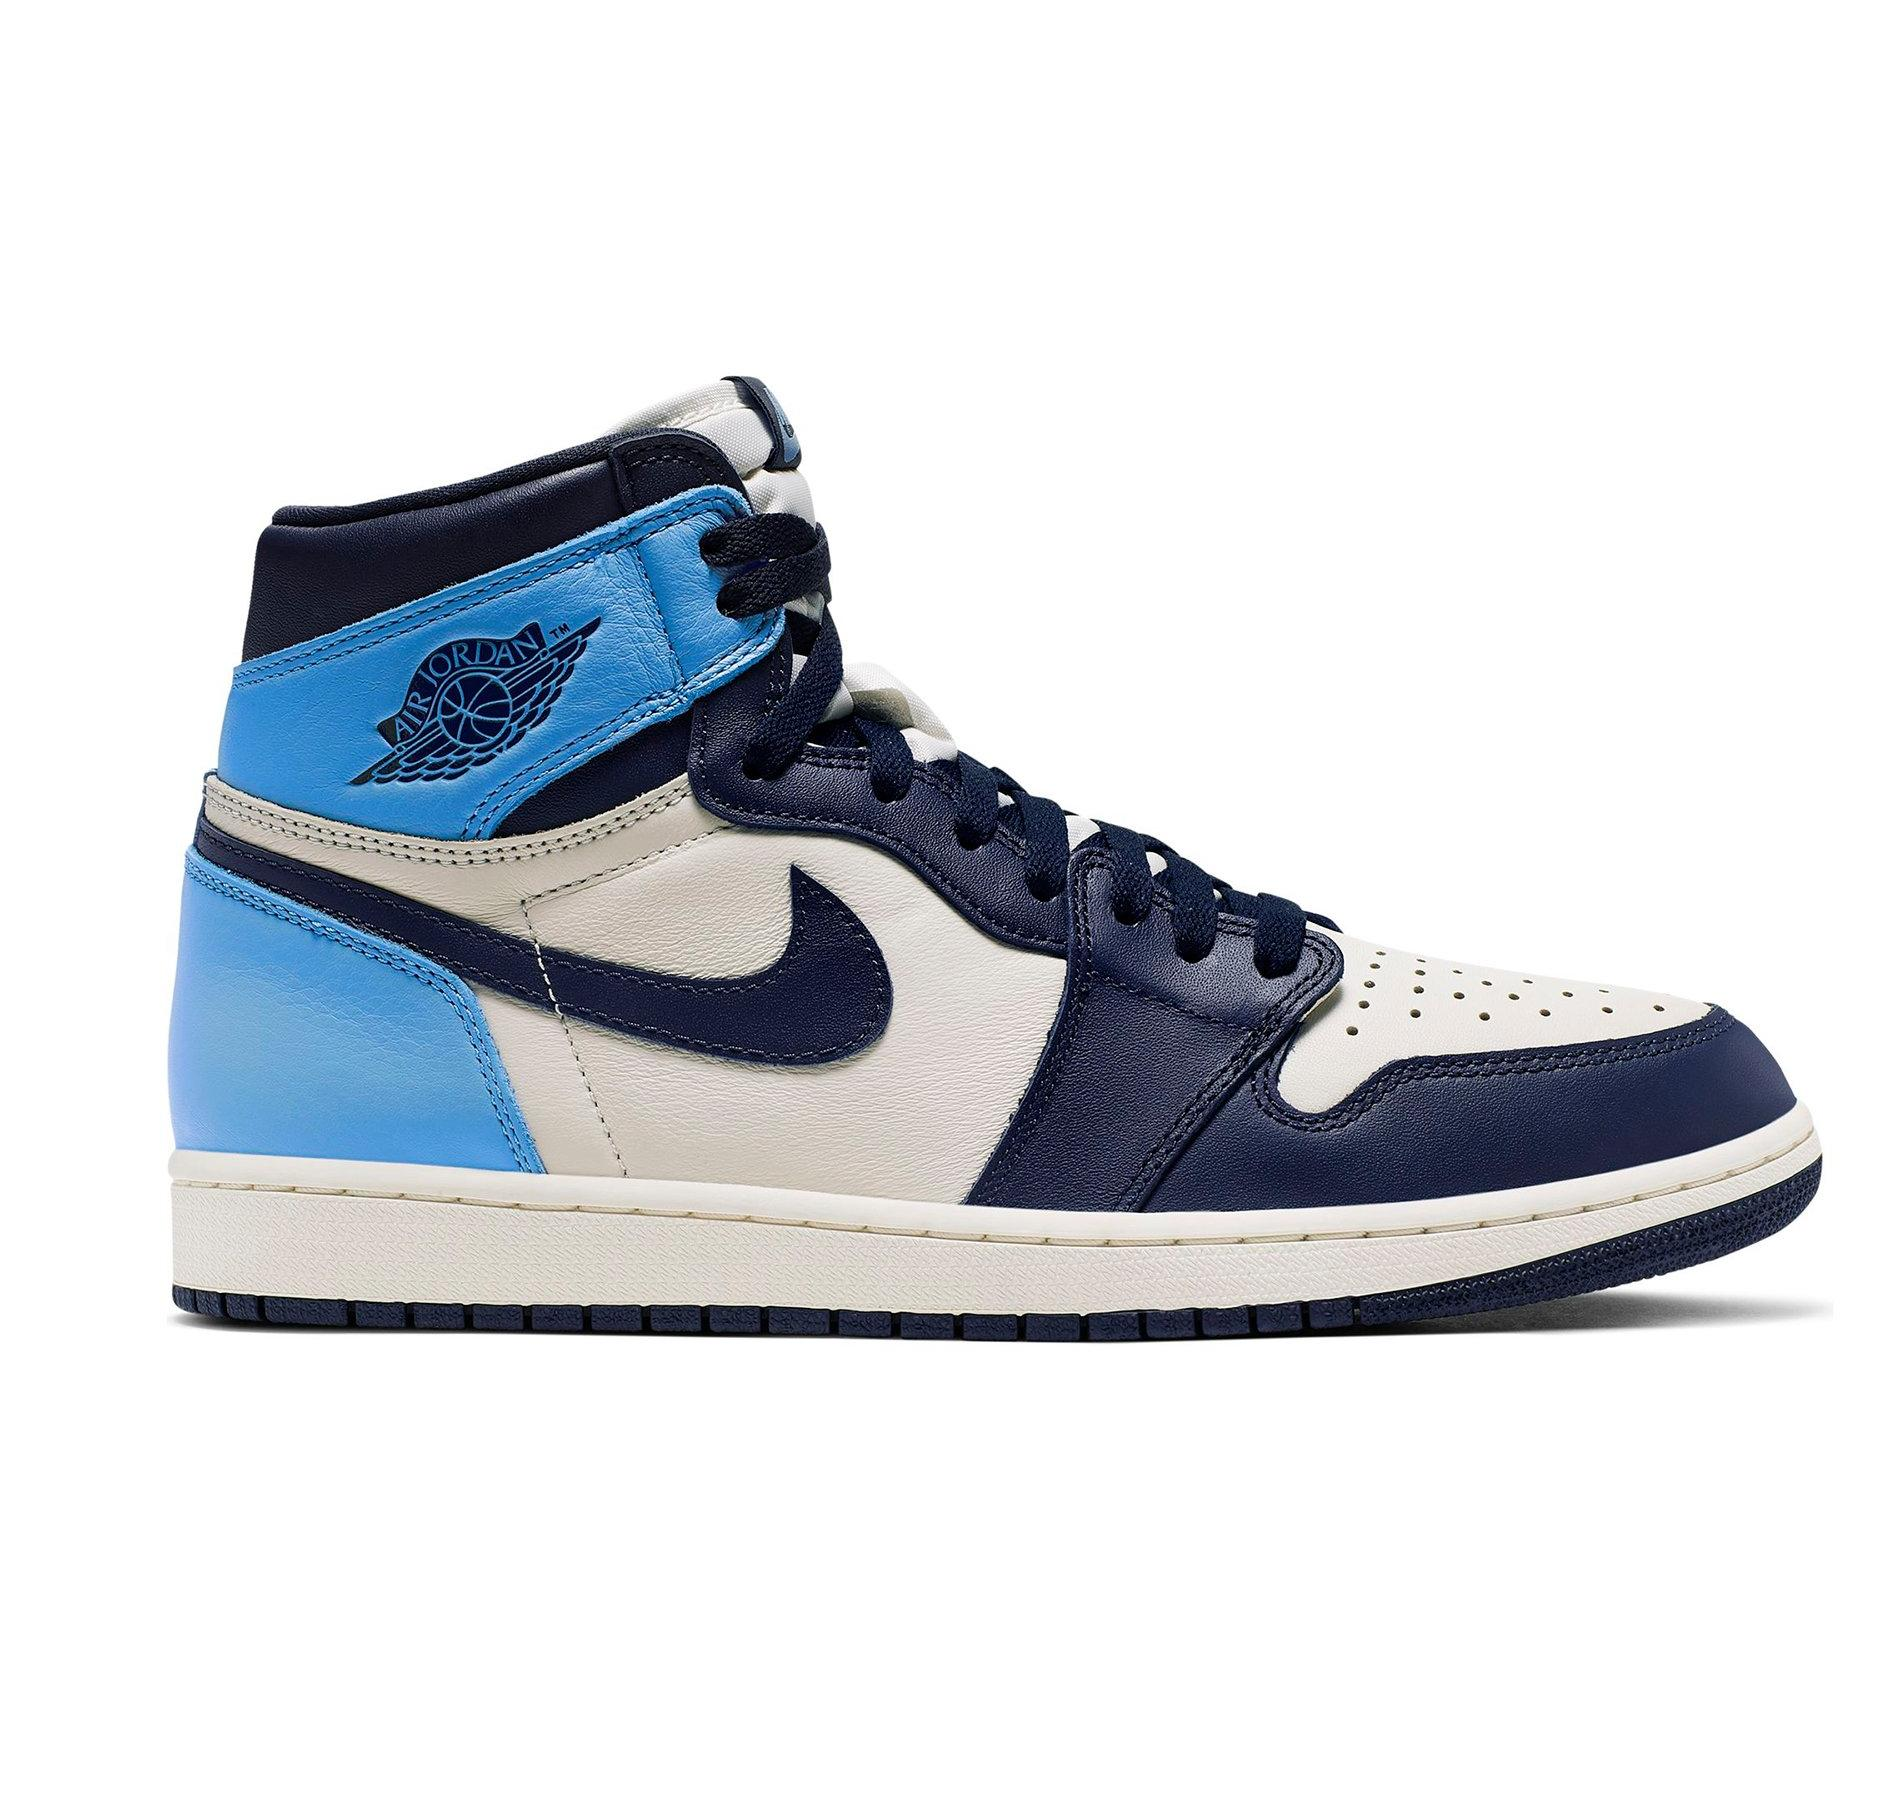 "the best attitude df764 03767 Sneakers Release : Air Jordan 1 Retro High OG ""Obsidian ..."